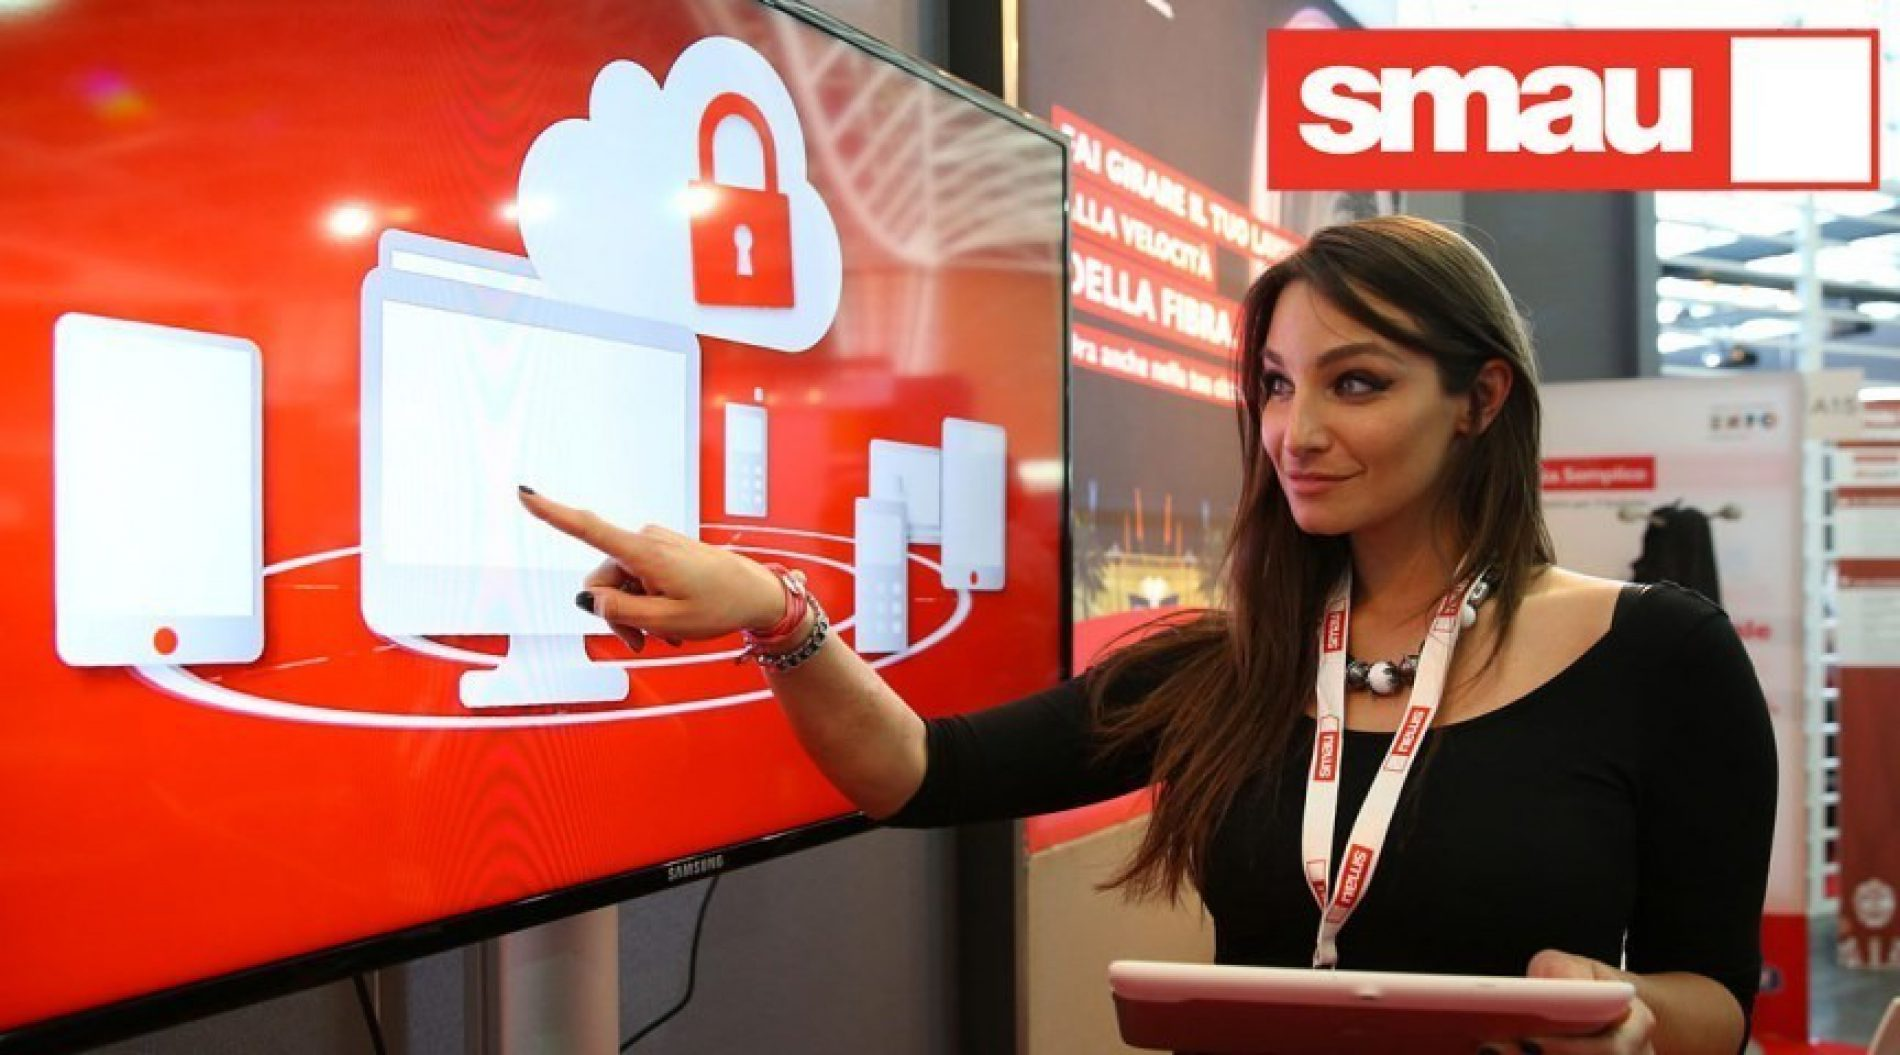 SMAU: Fiera Tecnologica a Napoli